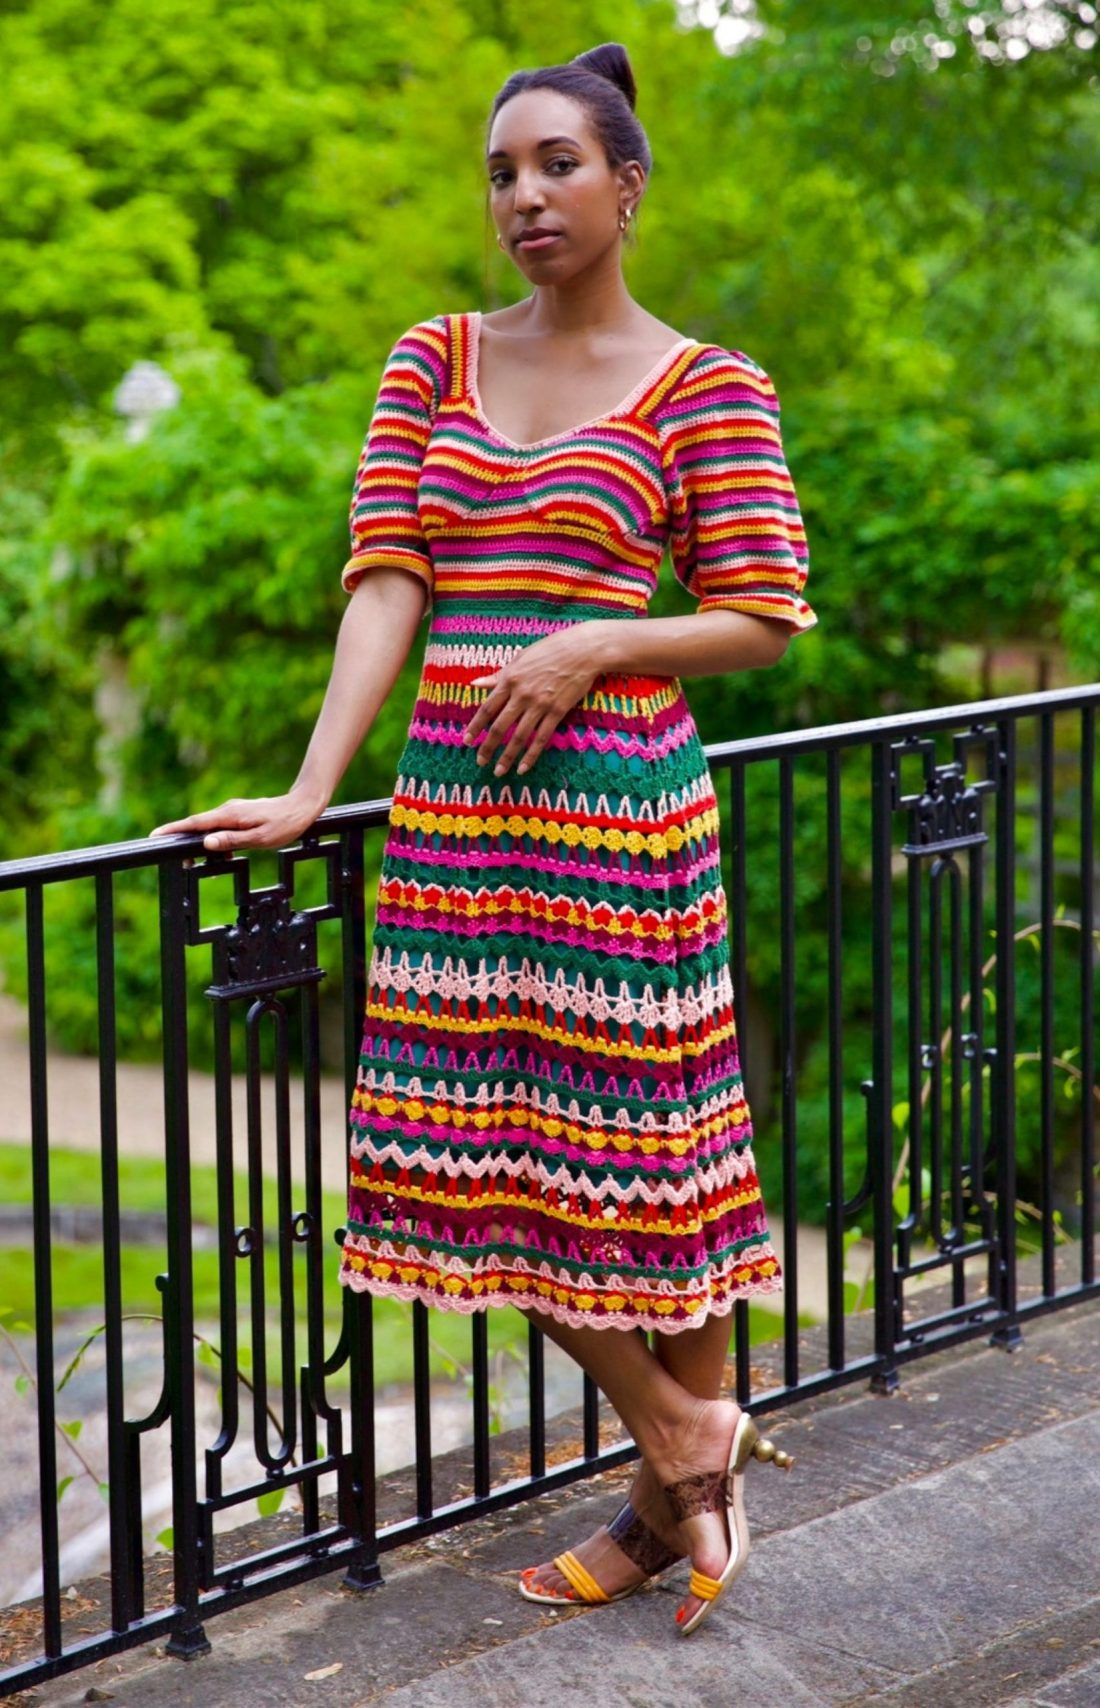 Lana Jackson stands posing against garden patio railing wearing Farm Rio Crochet Midi Dress